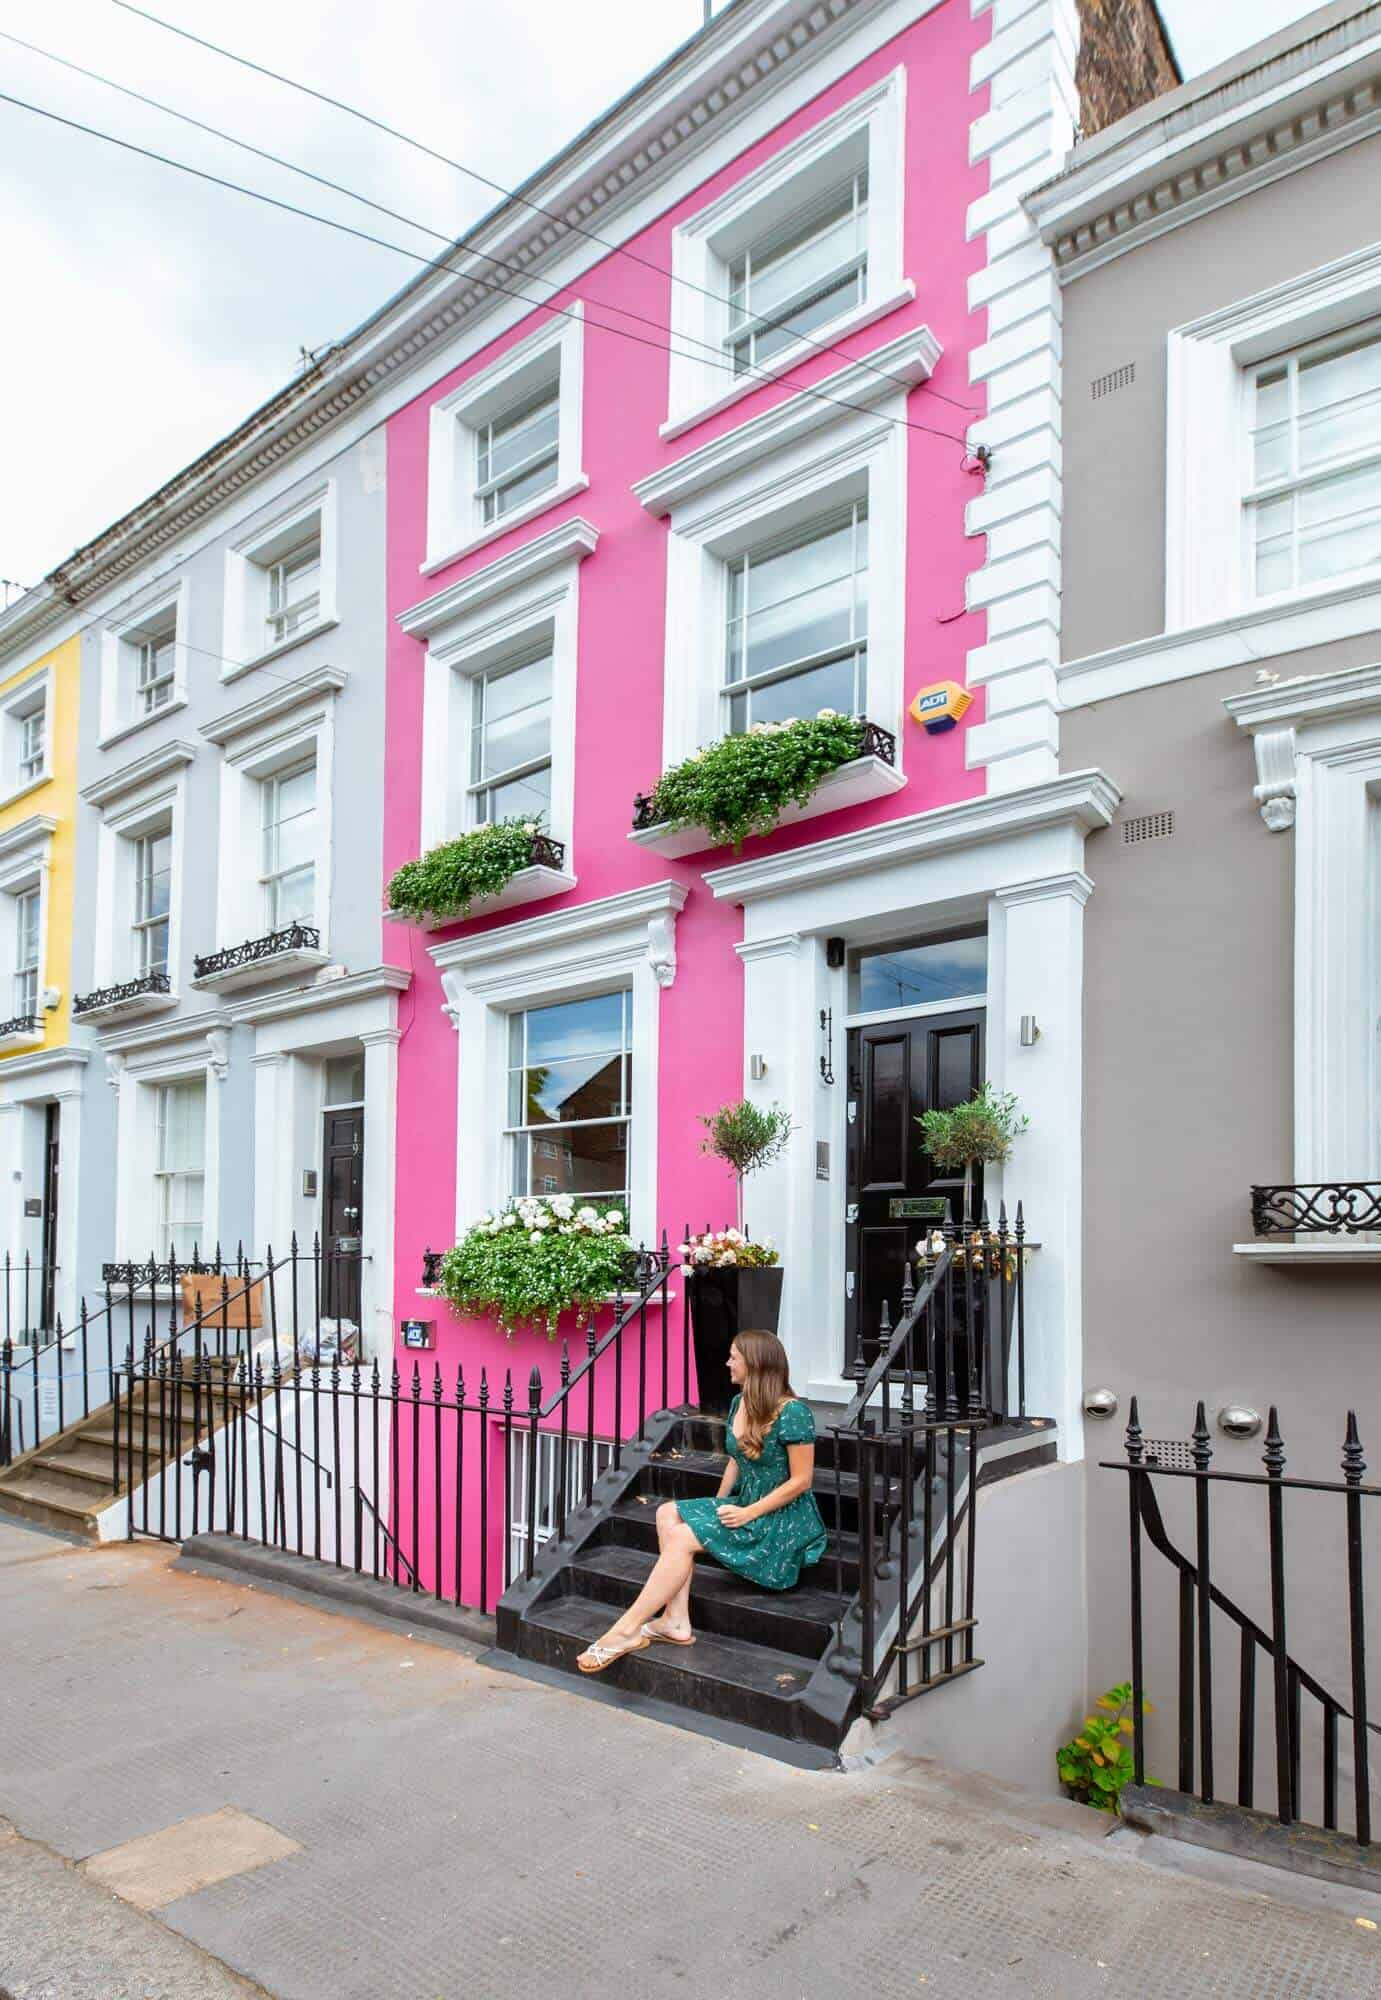 Colourful houses on Denbigh Terrace, Notting Hill, London